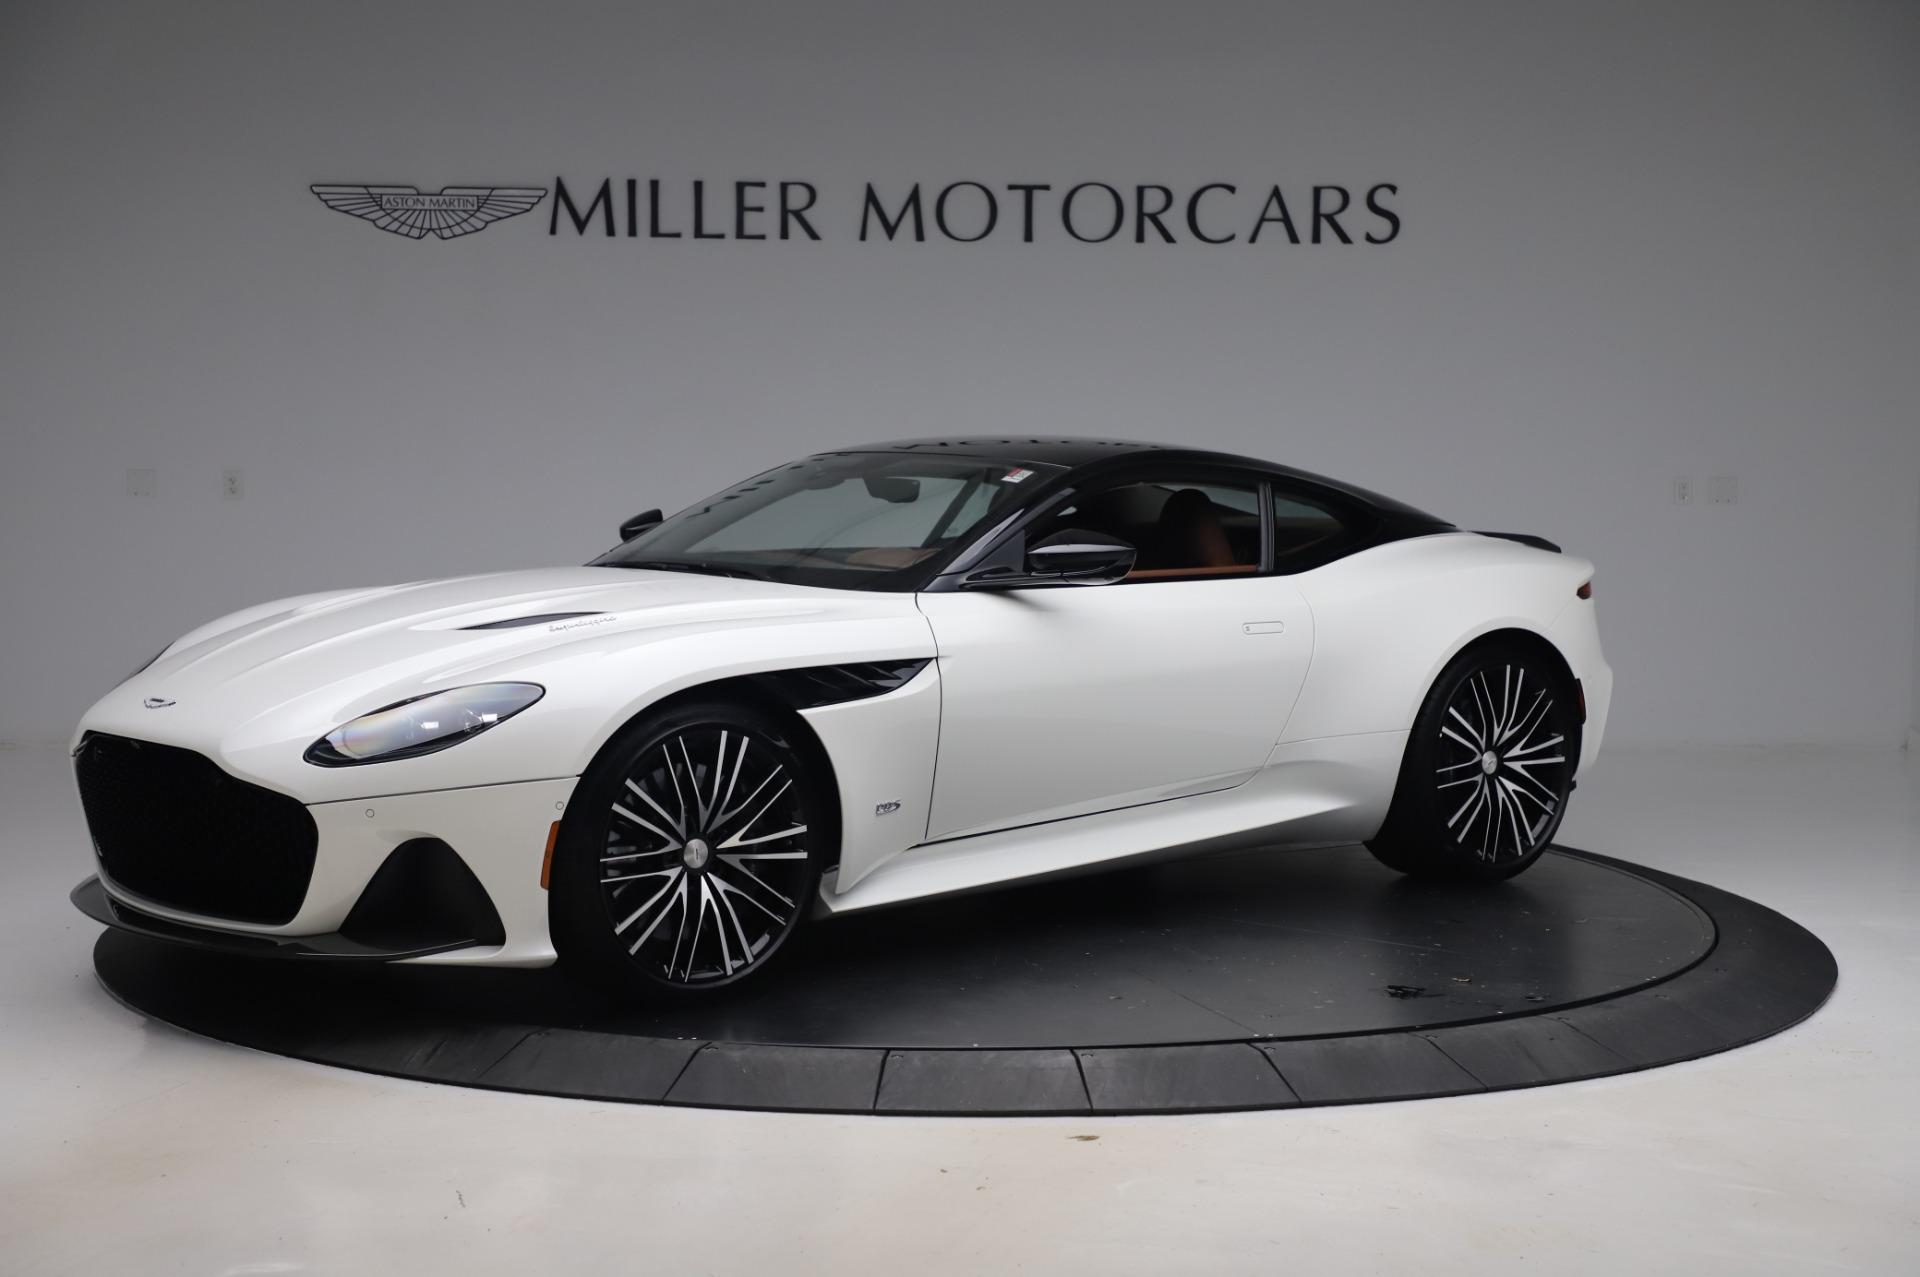 Used 2020 Aston Martin DBS Superleggera for sale $299,990 at Maserati of Greenwich in Greenwich CT 06830 1